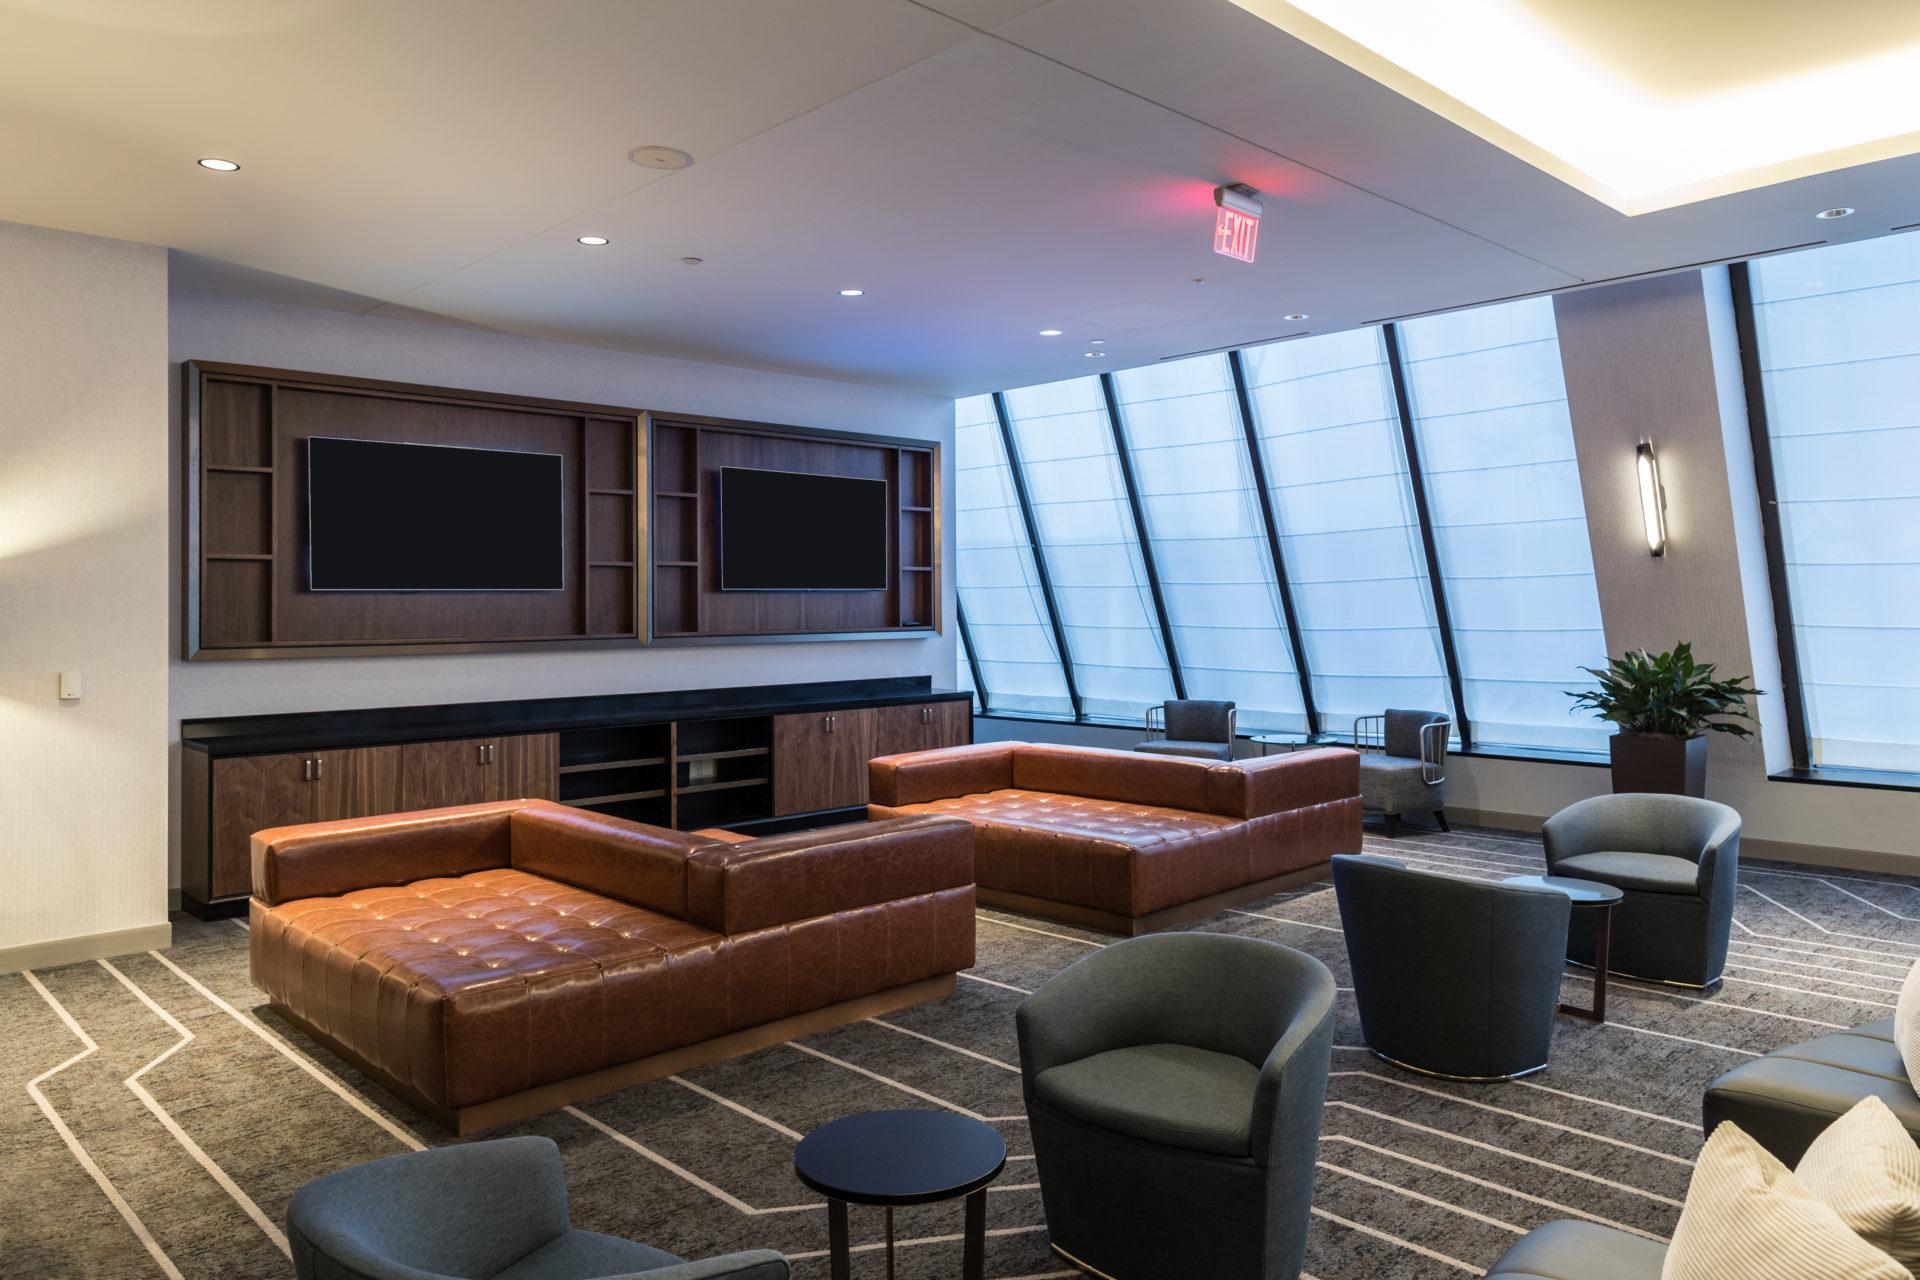 Interior design includes lounge area